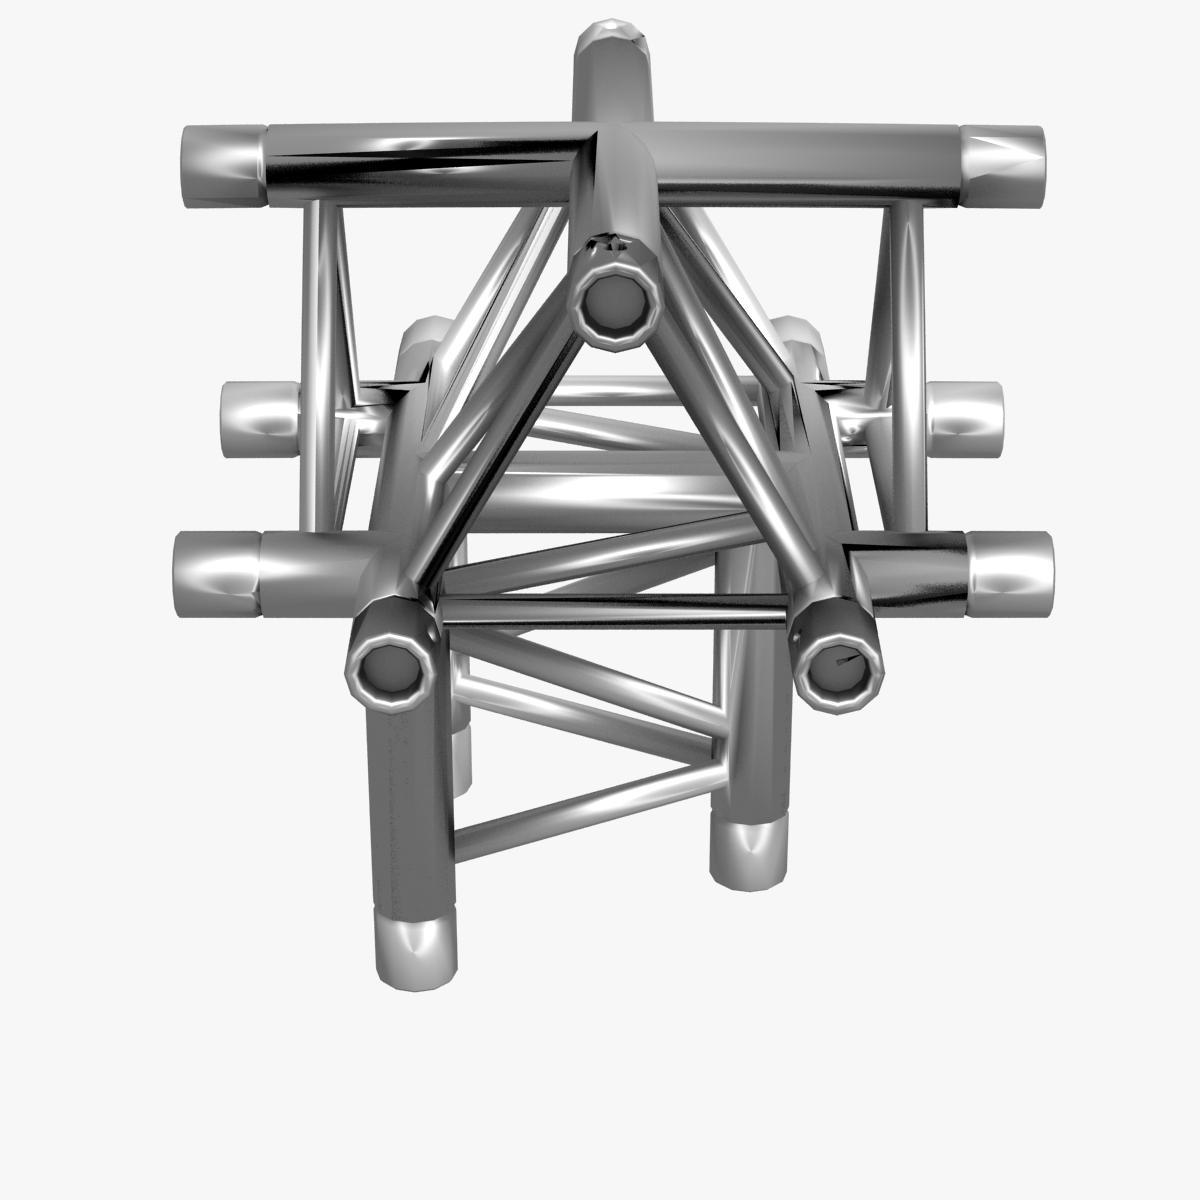 triangular trusses (collection 55 modular pieces) 3d model 3ds max dxf fbx c4d dae texture obj 216230